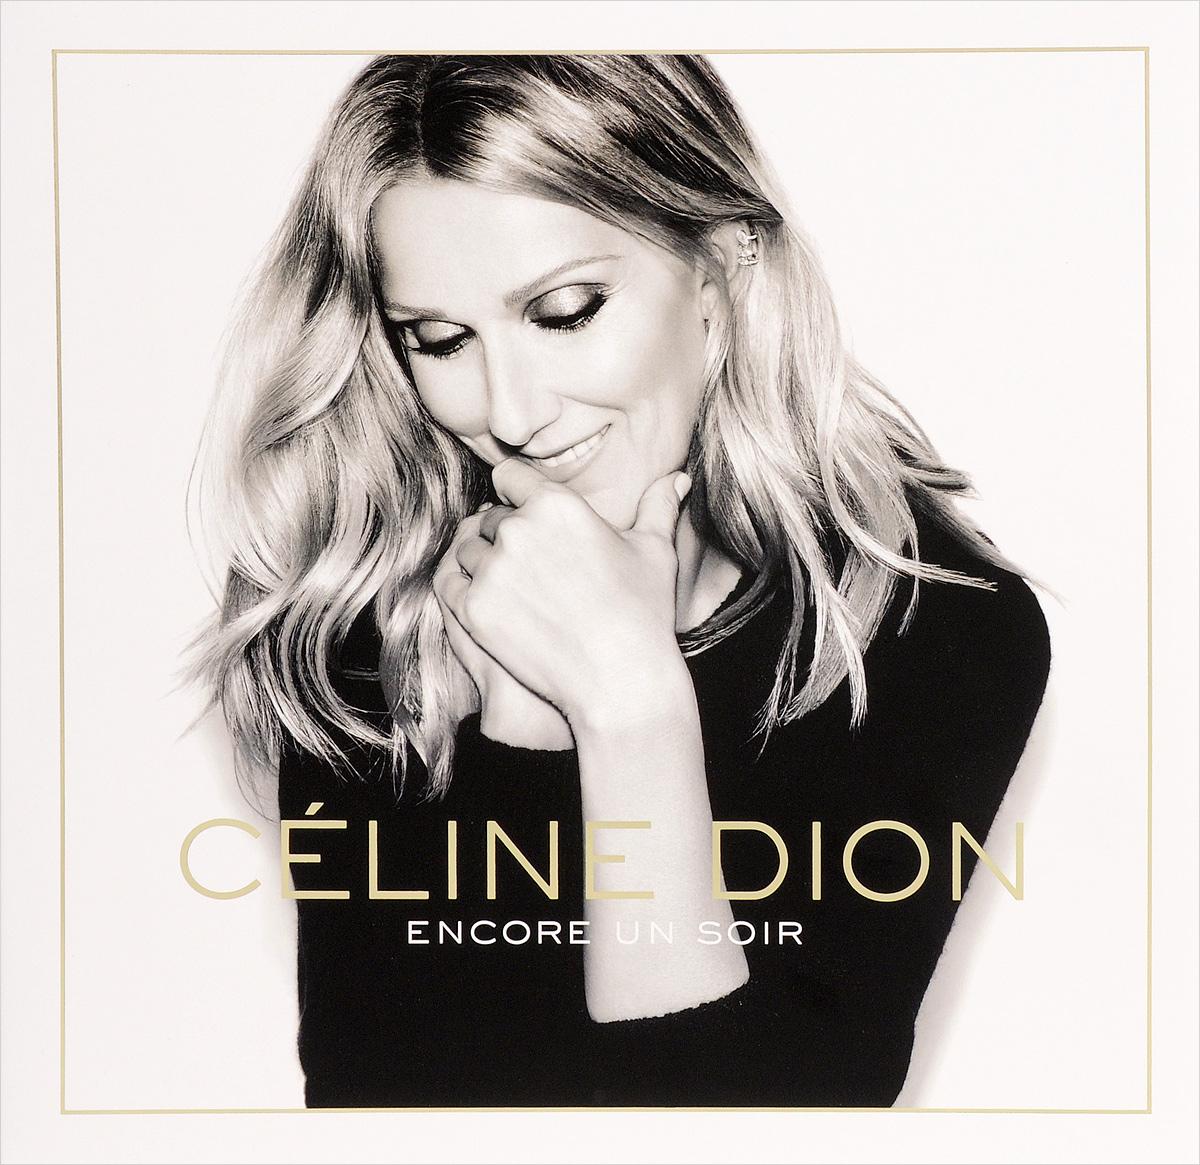 Селин Дион Celine Dion. Encore Un Soire (2 LP + CD) барбра стрейзанд barbra streisand encore movie partners sing broadway lp